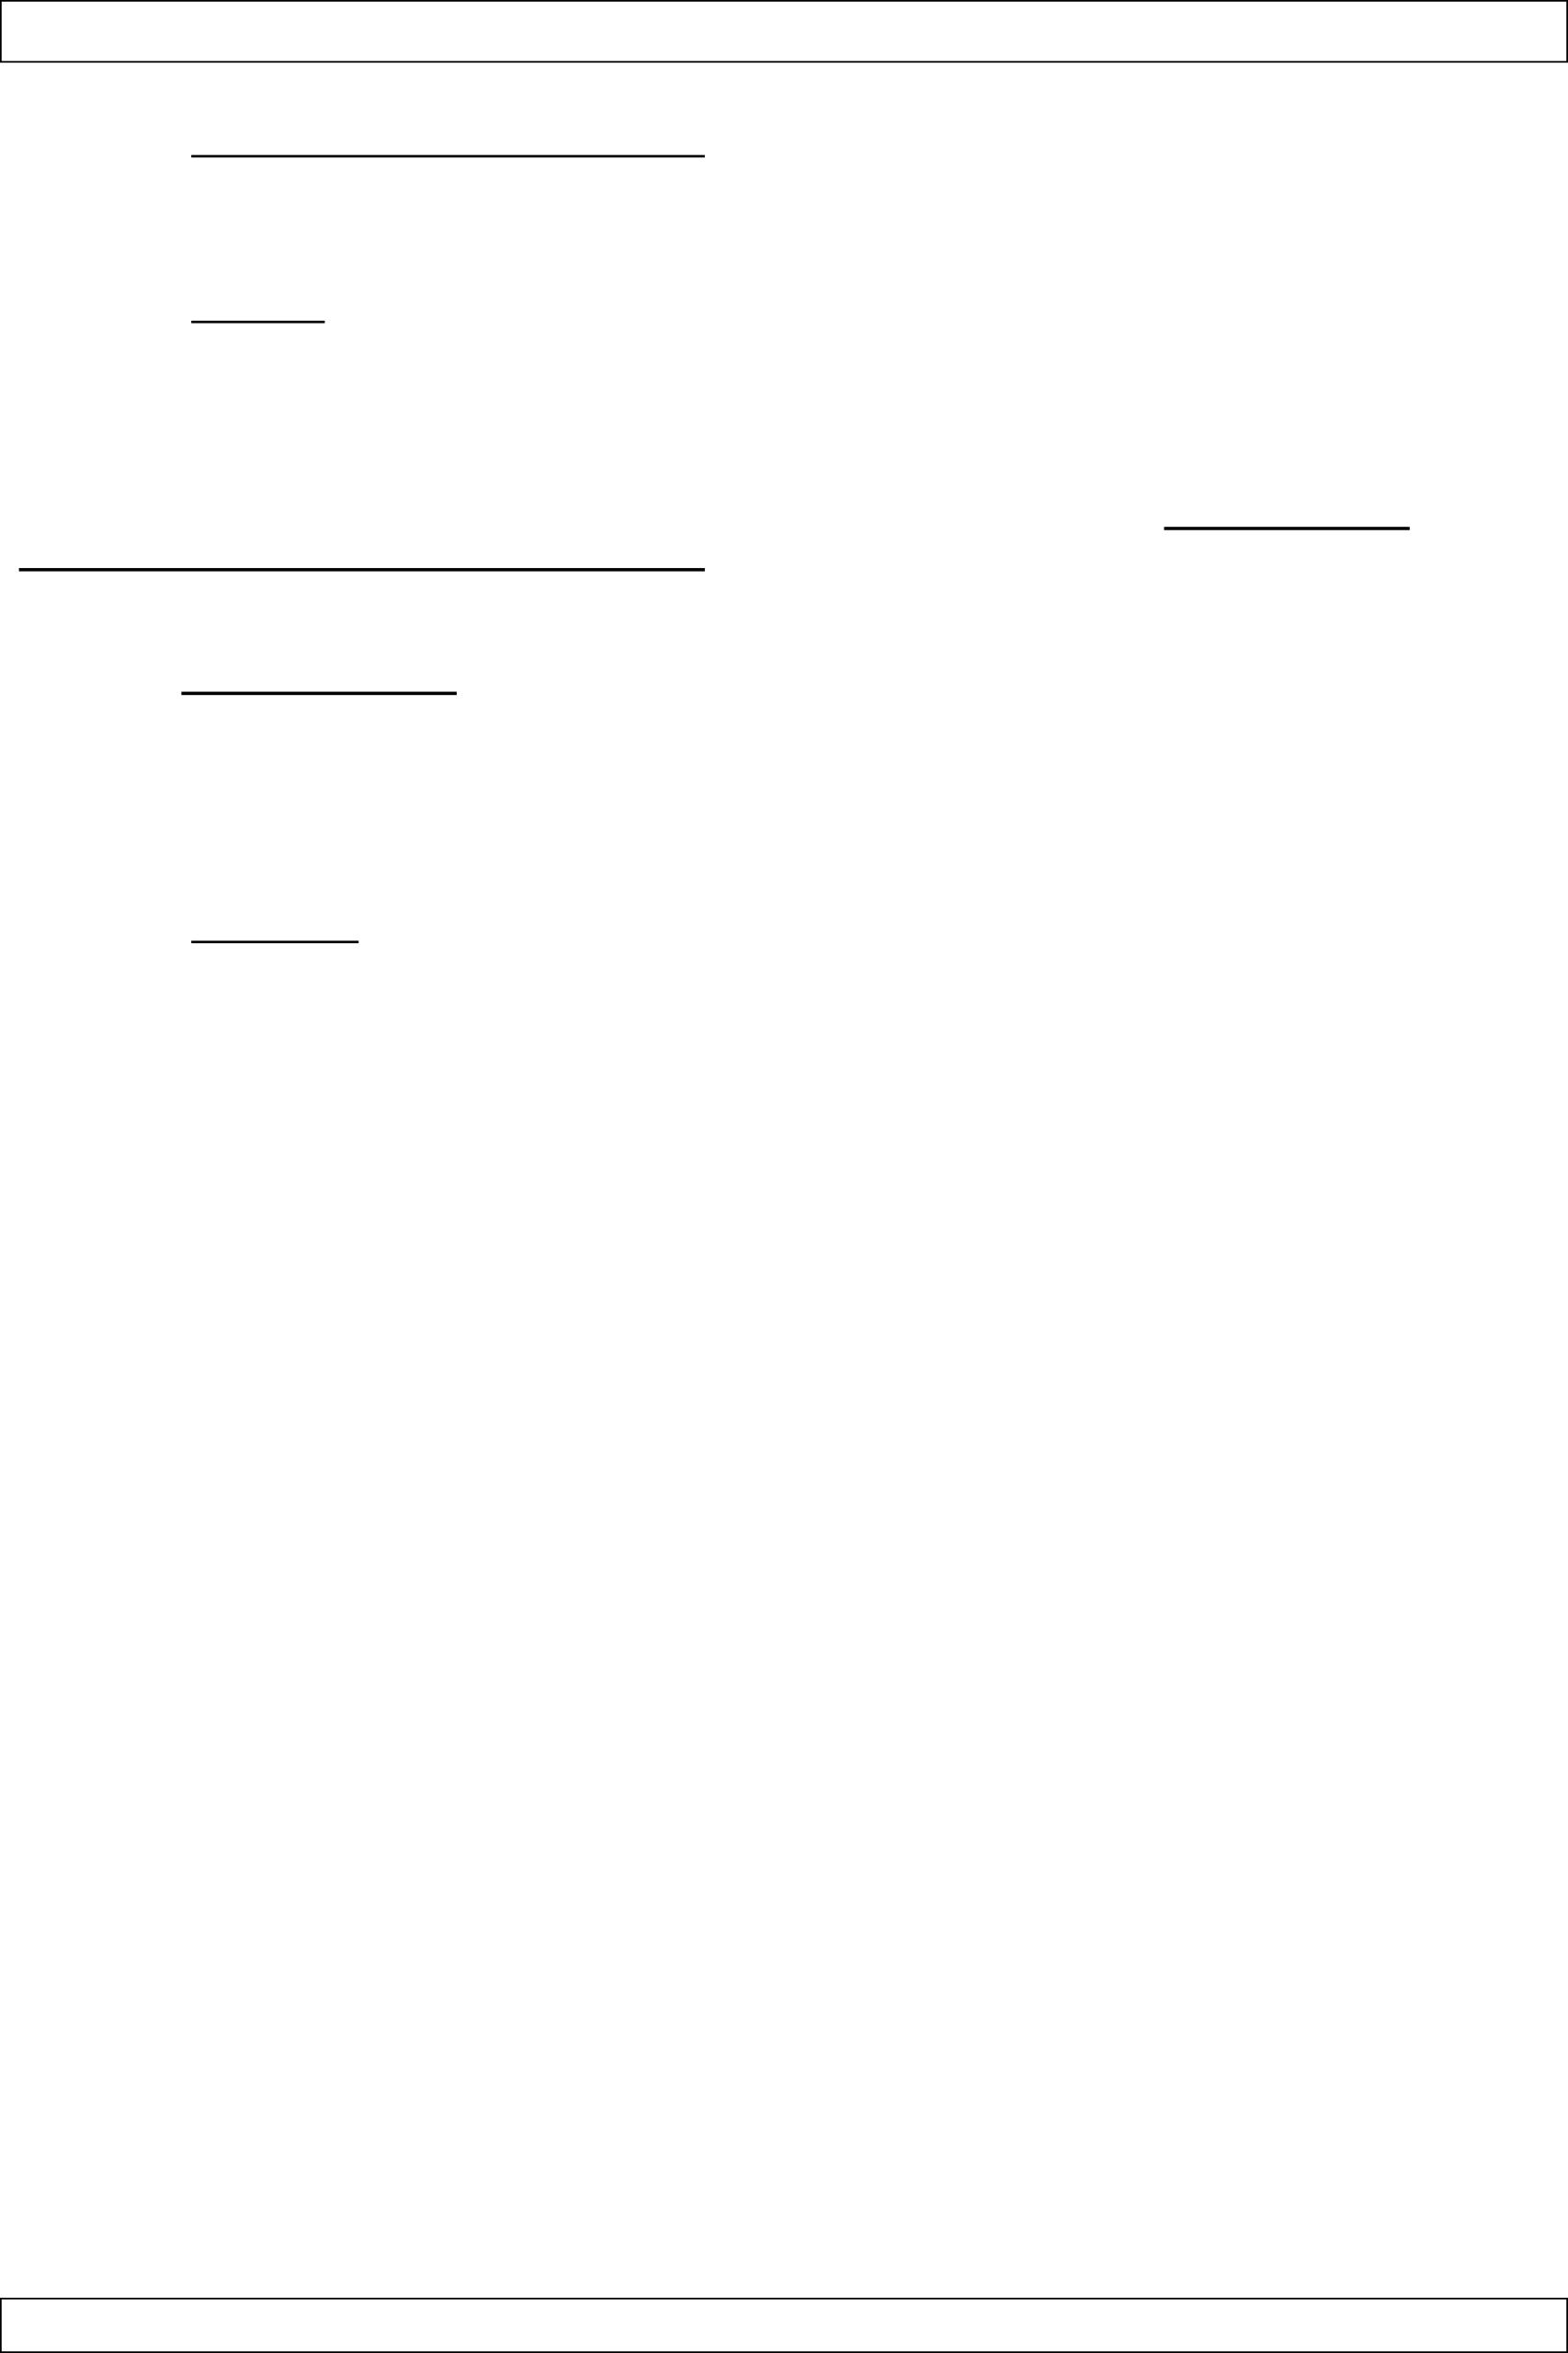 Presentence Investigation Report Form – Texas – Edit, Fill In Presentence Investigation Report Template